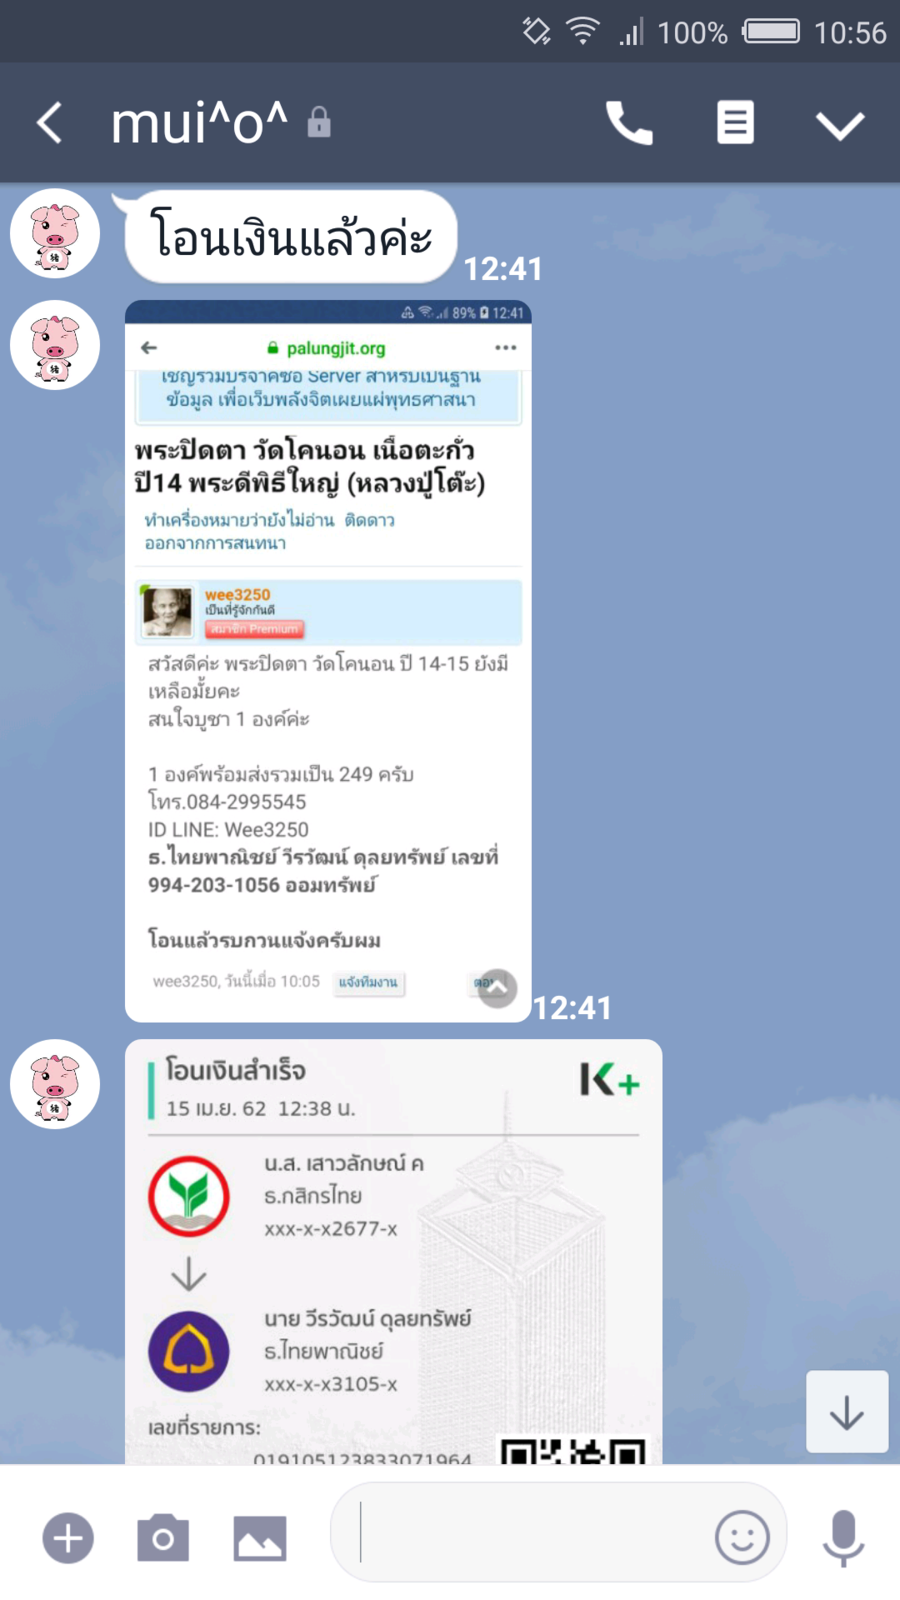 Screenshot_2019-04-16-10-56-22.png